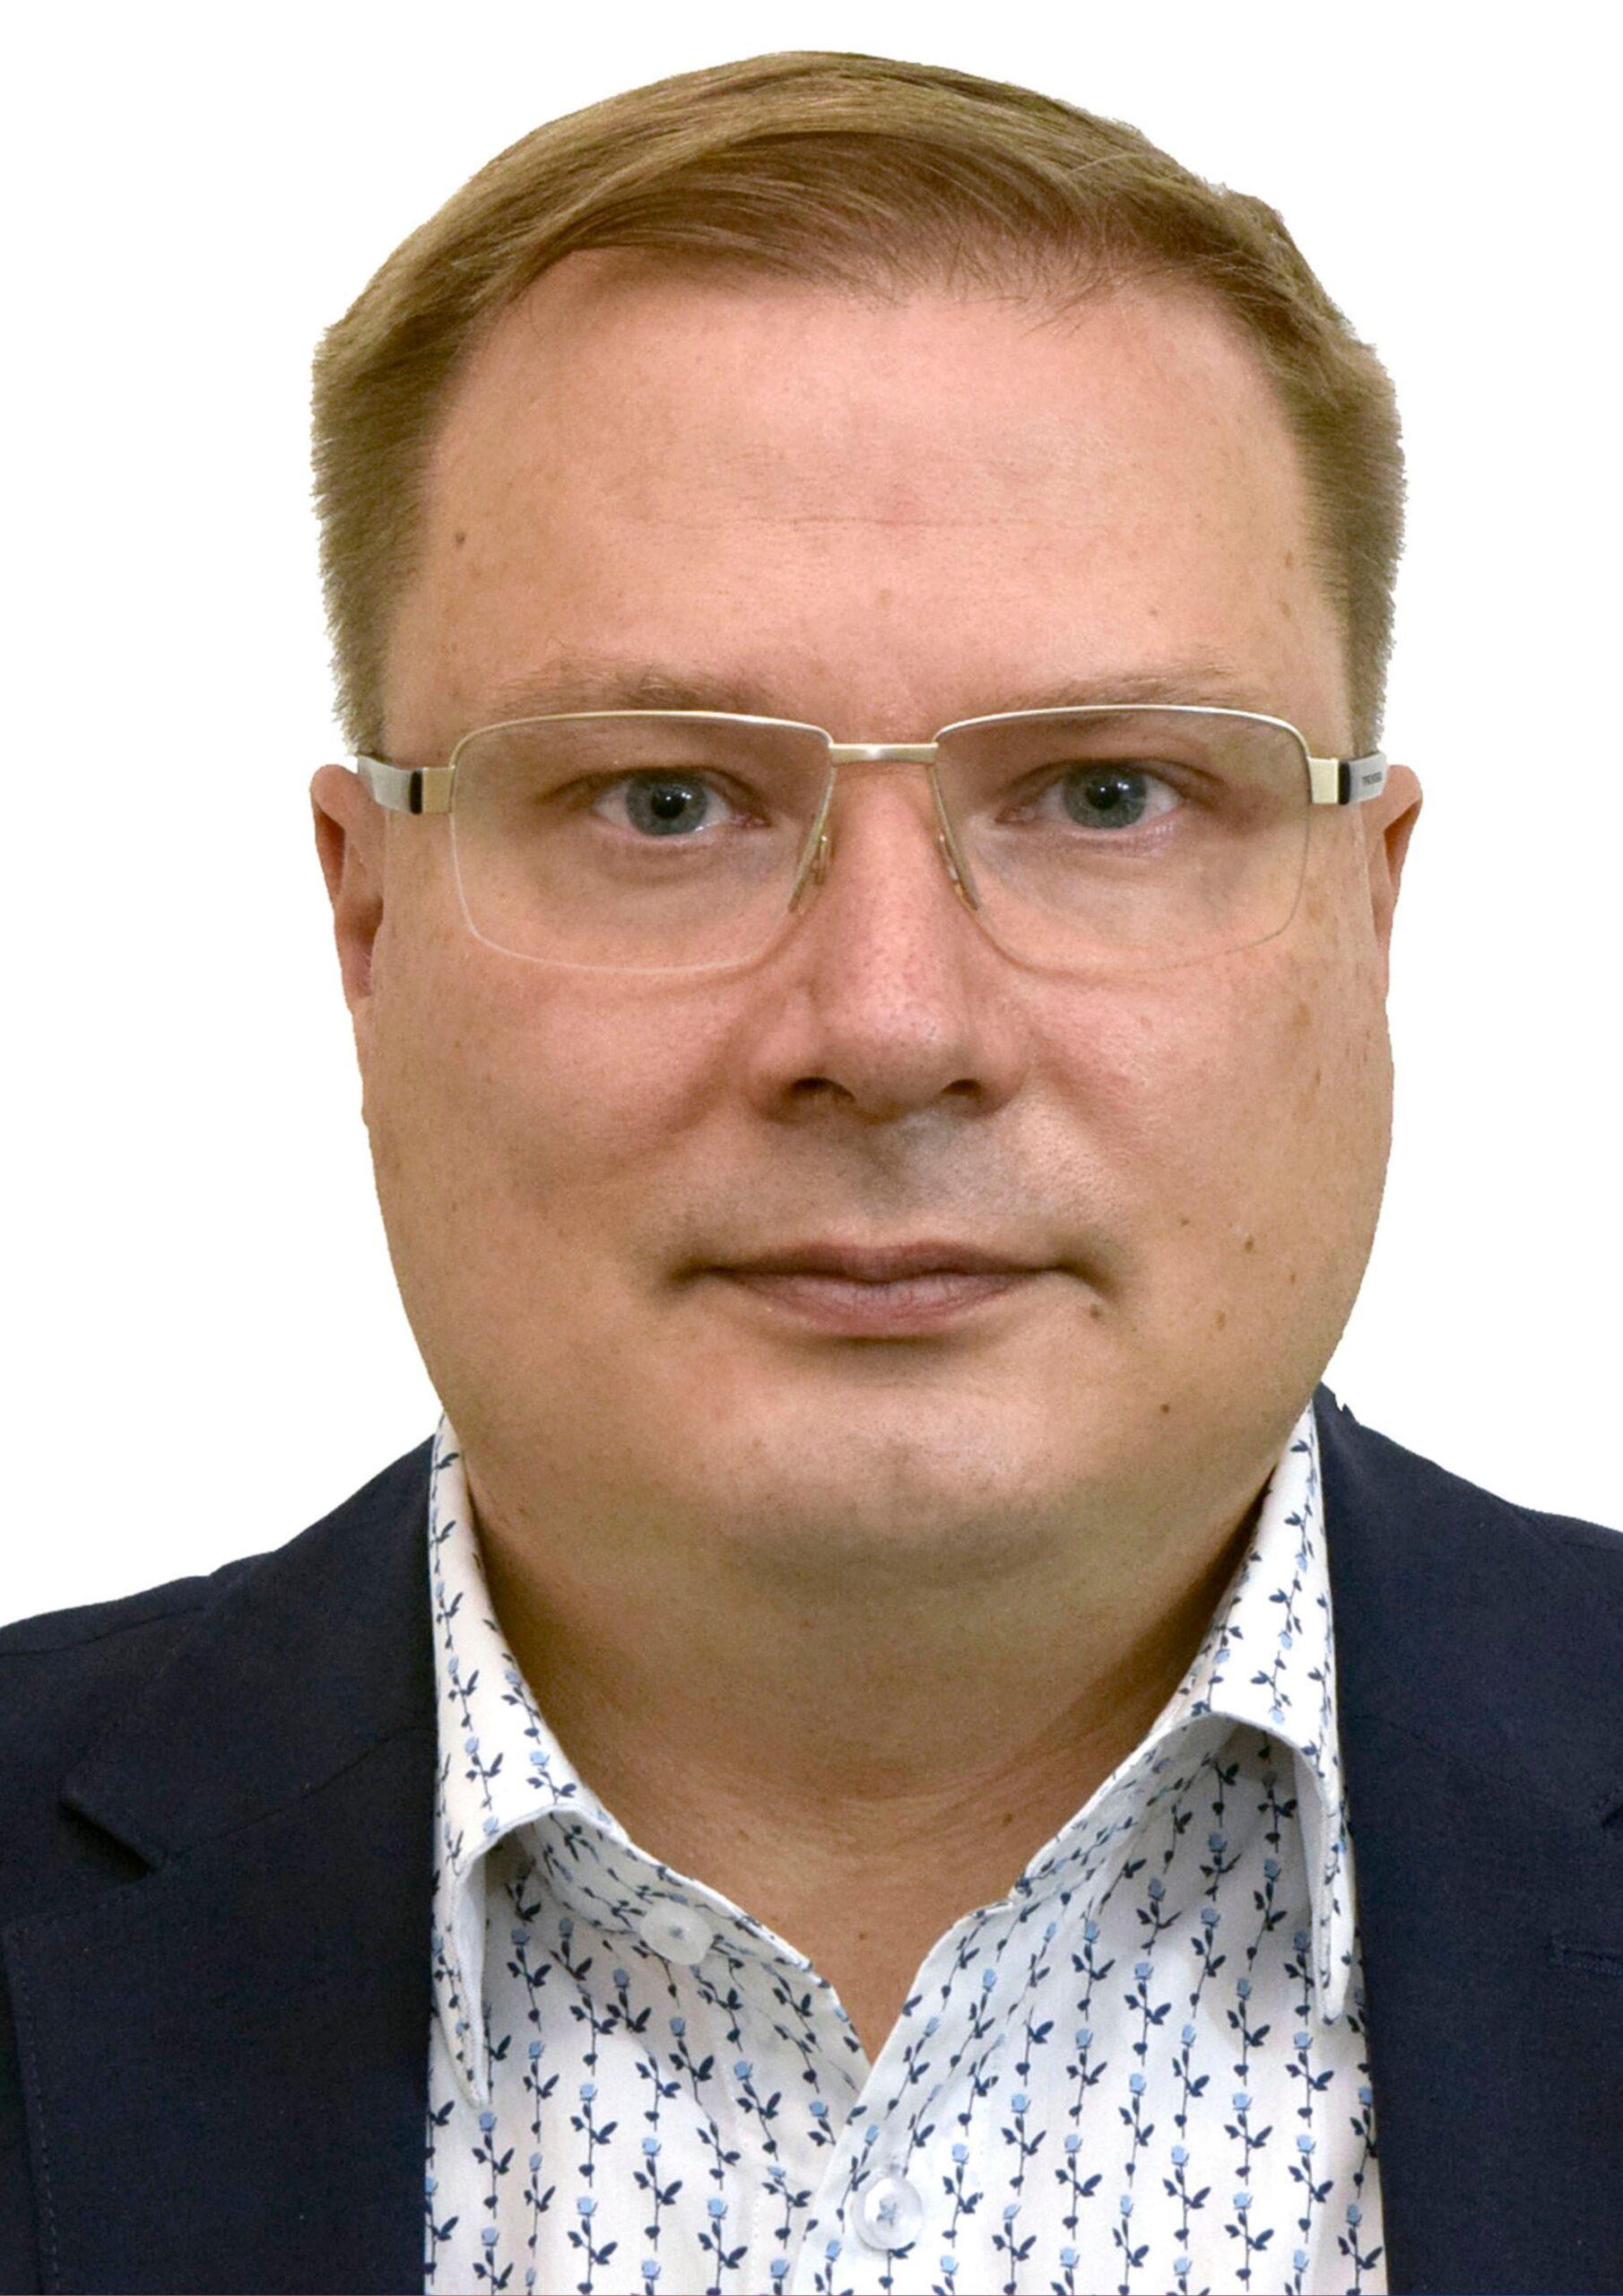 Mr. Jukka Tulivuori